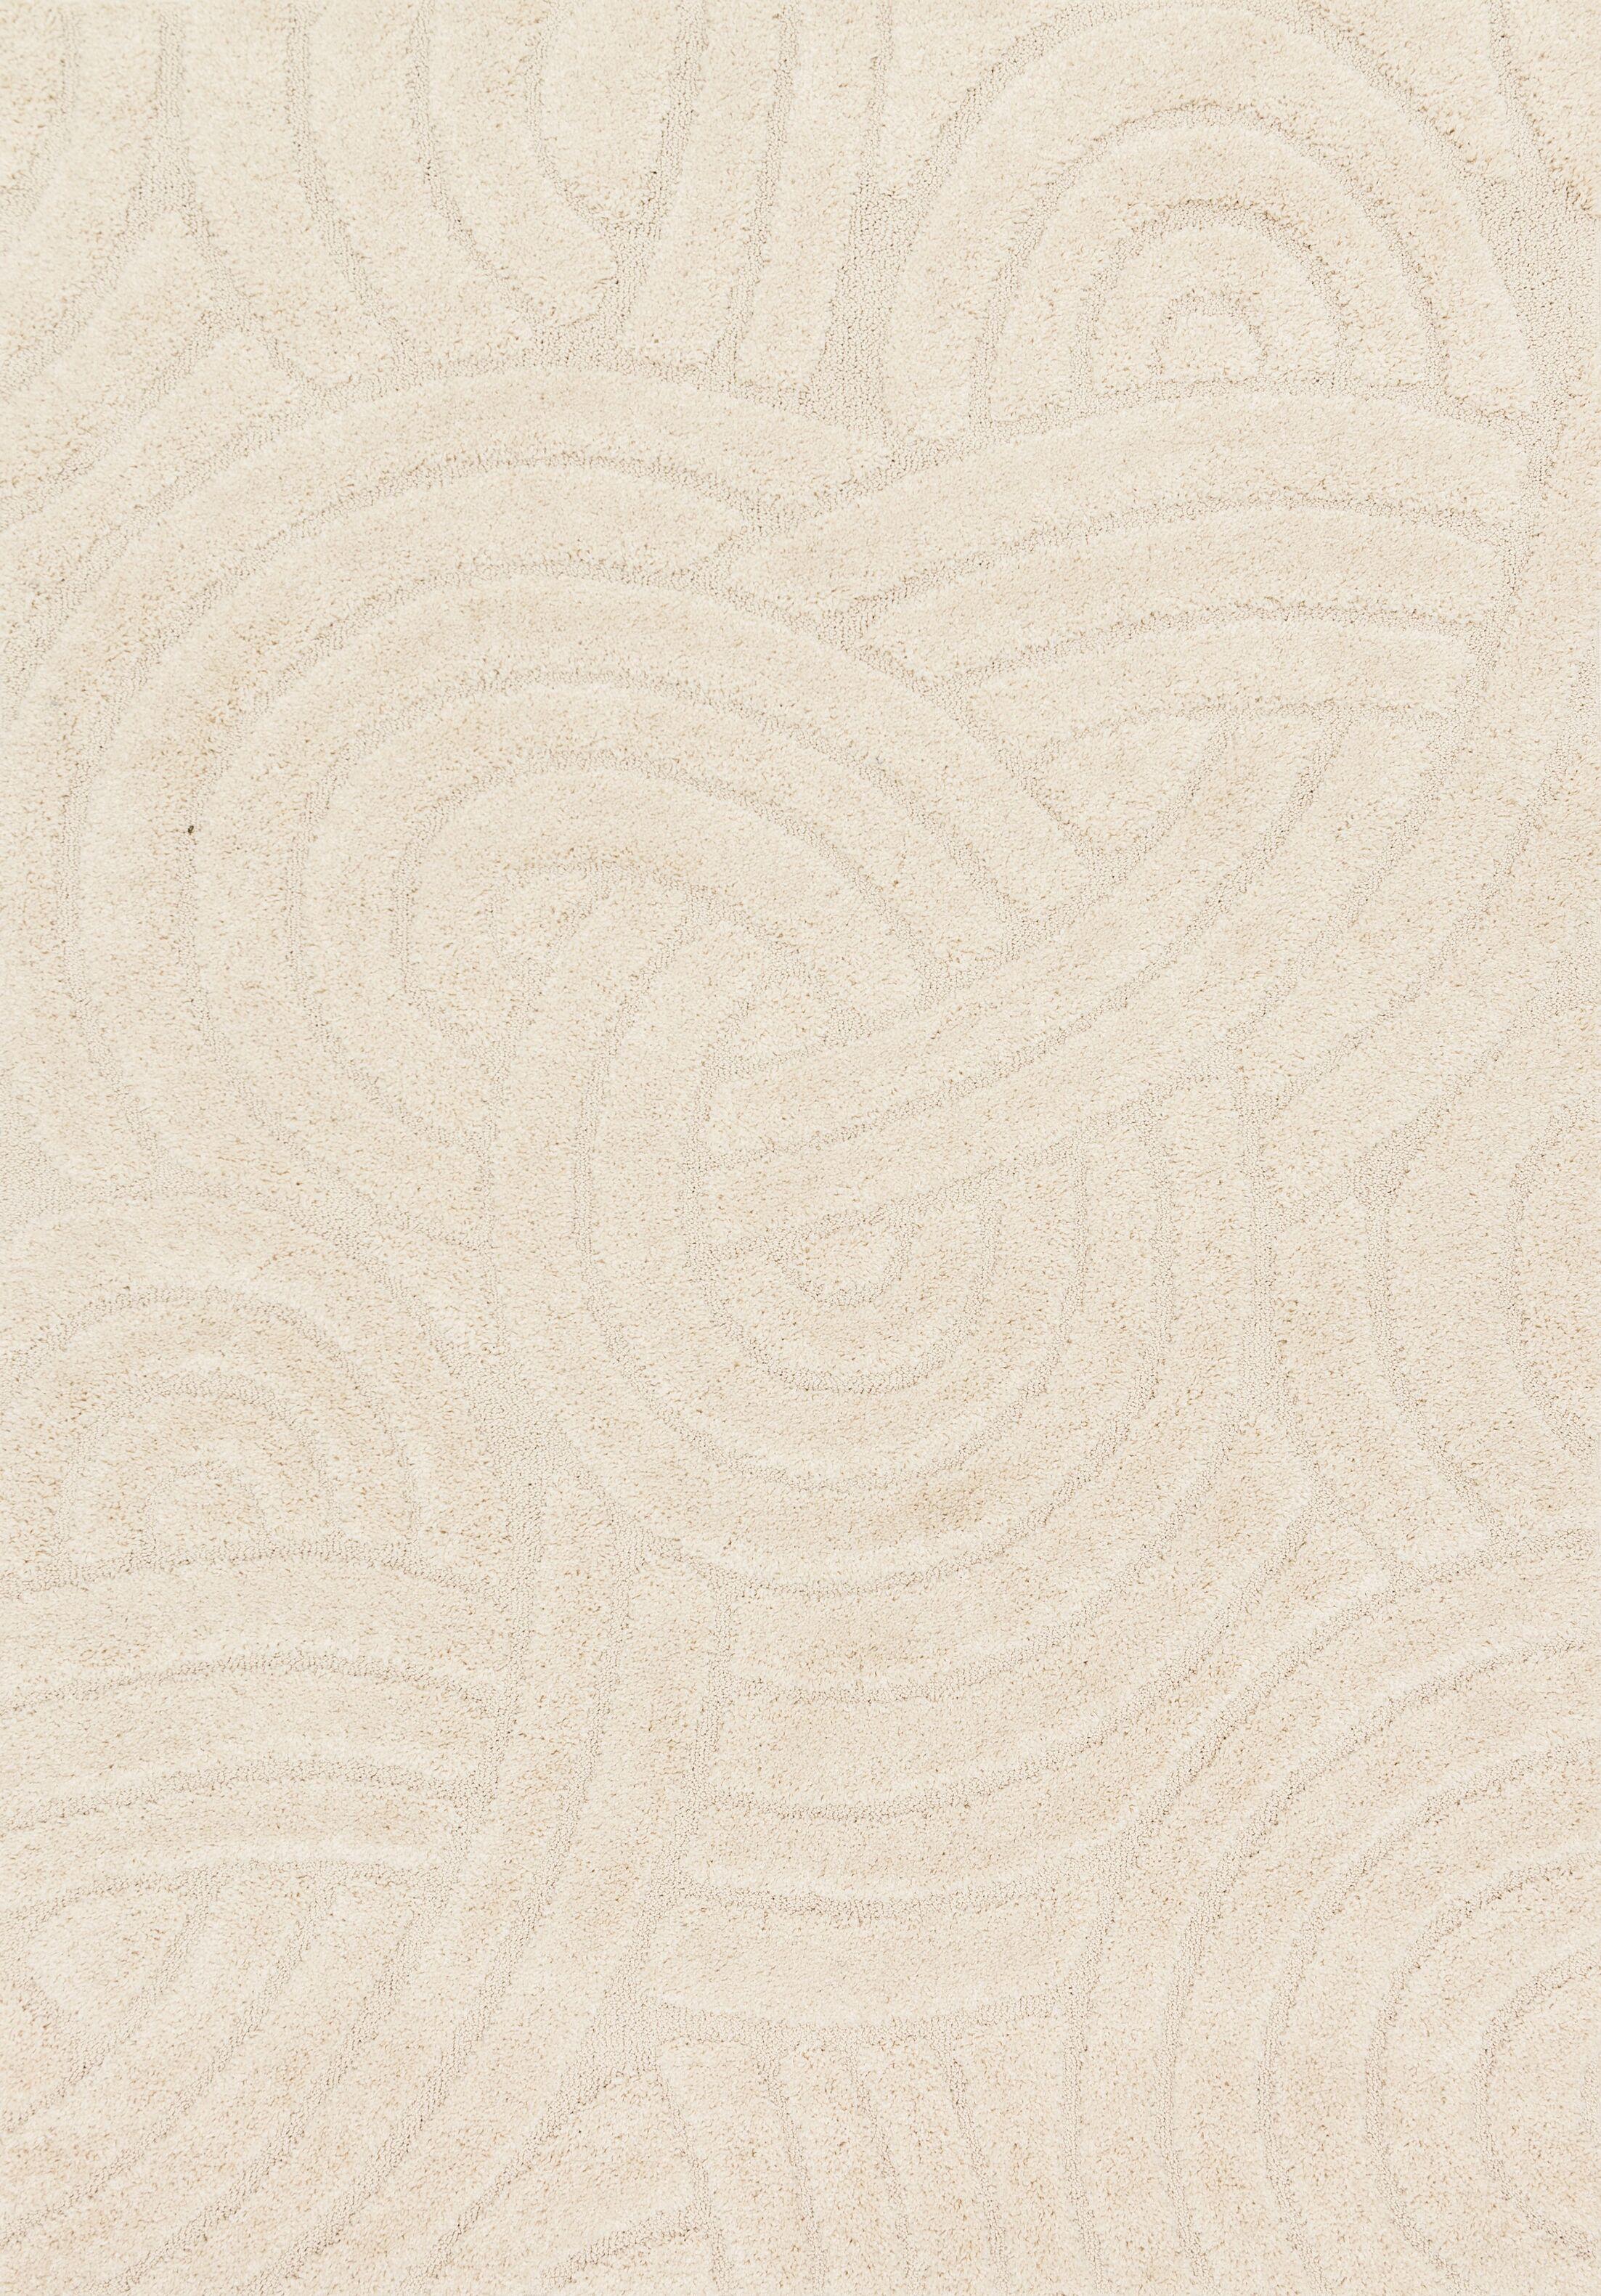 Dania Ivory Area Rug Rug Size: Rectangle 7'7